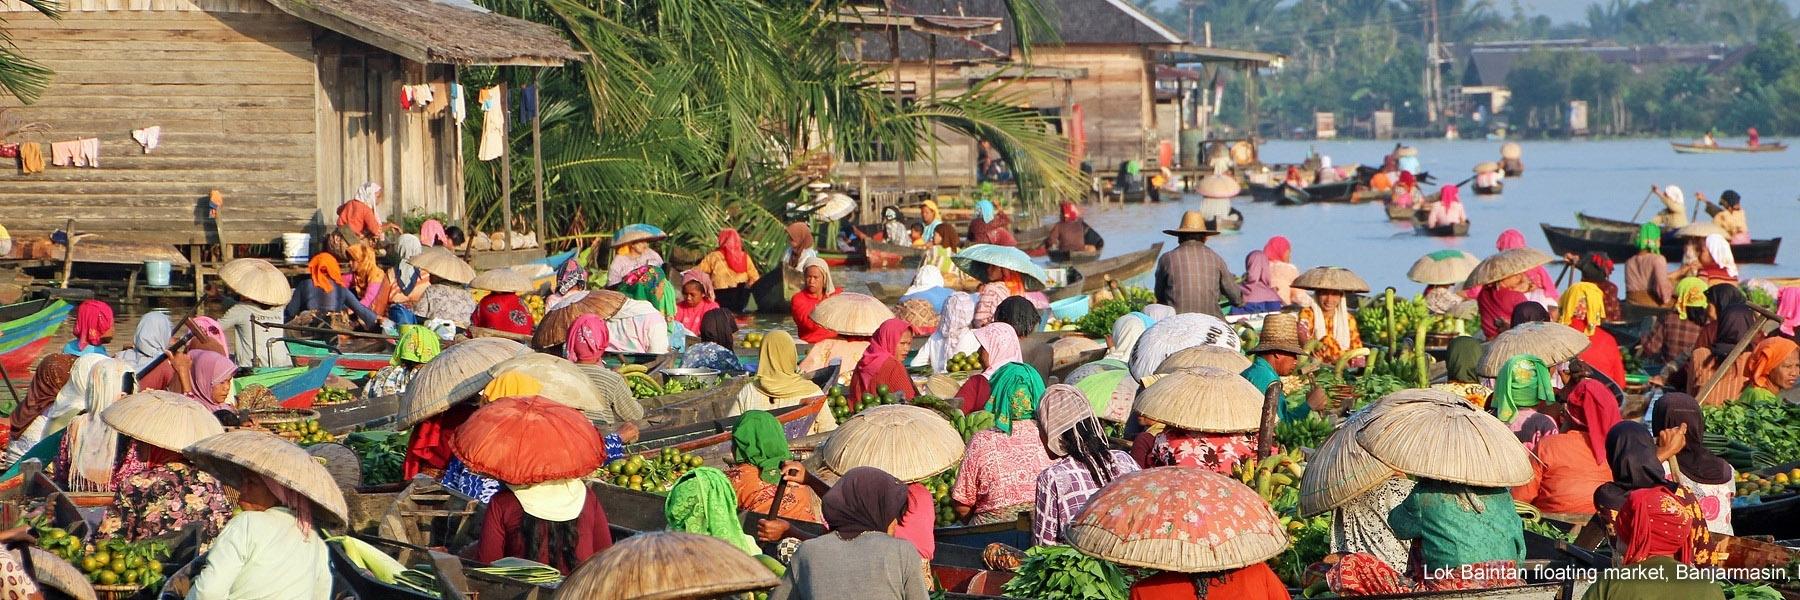 https://gody.vn/blog/thanhduy1232353/post/vi-vu-mot-vong-dong-kalimanta-thu-do-tuong-lai-cua-indonesia-4711